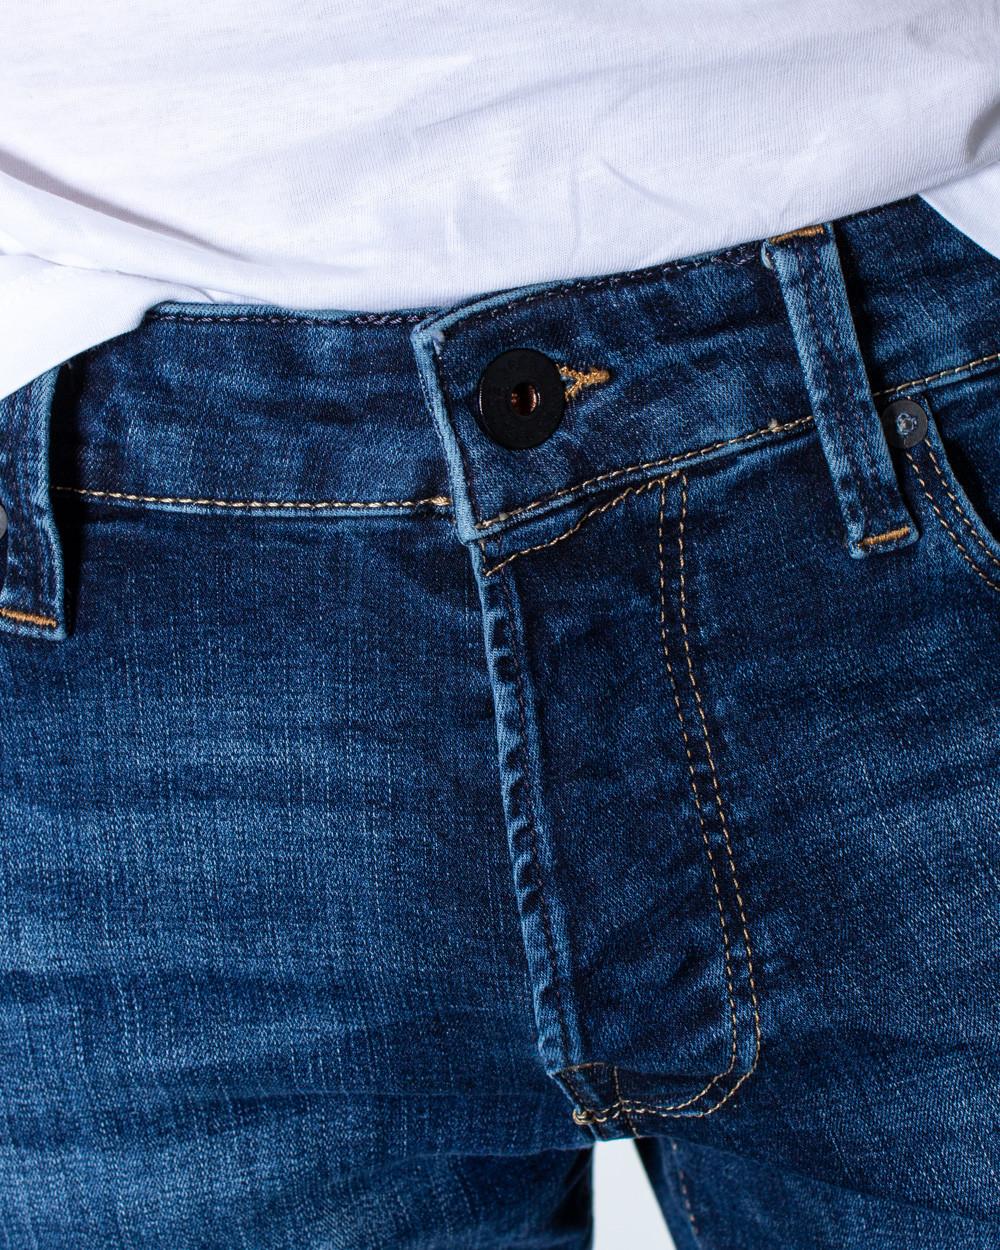 Marchio Jack Jones Genere Uomo Tipologia Jeans Stagione Primavera/Estate  D…